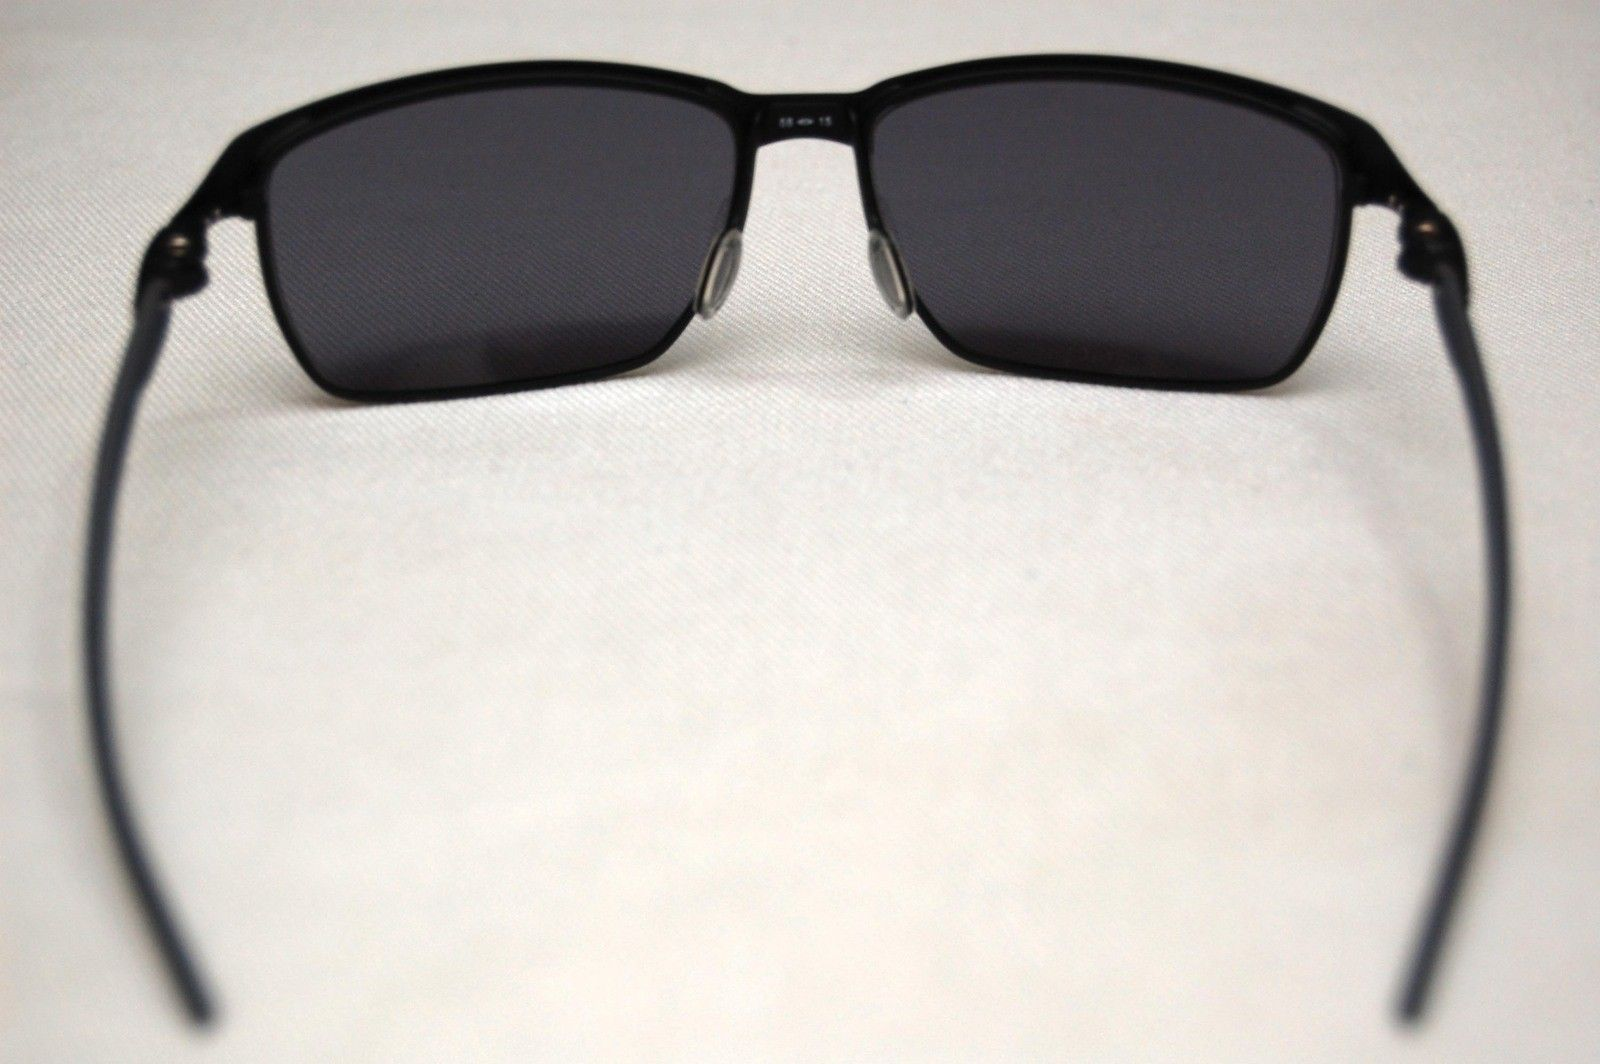 Tinfoil Carbon OO6018-01 Matte Black / Silver   Grey Lens - 02.jpg